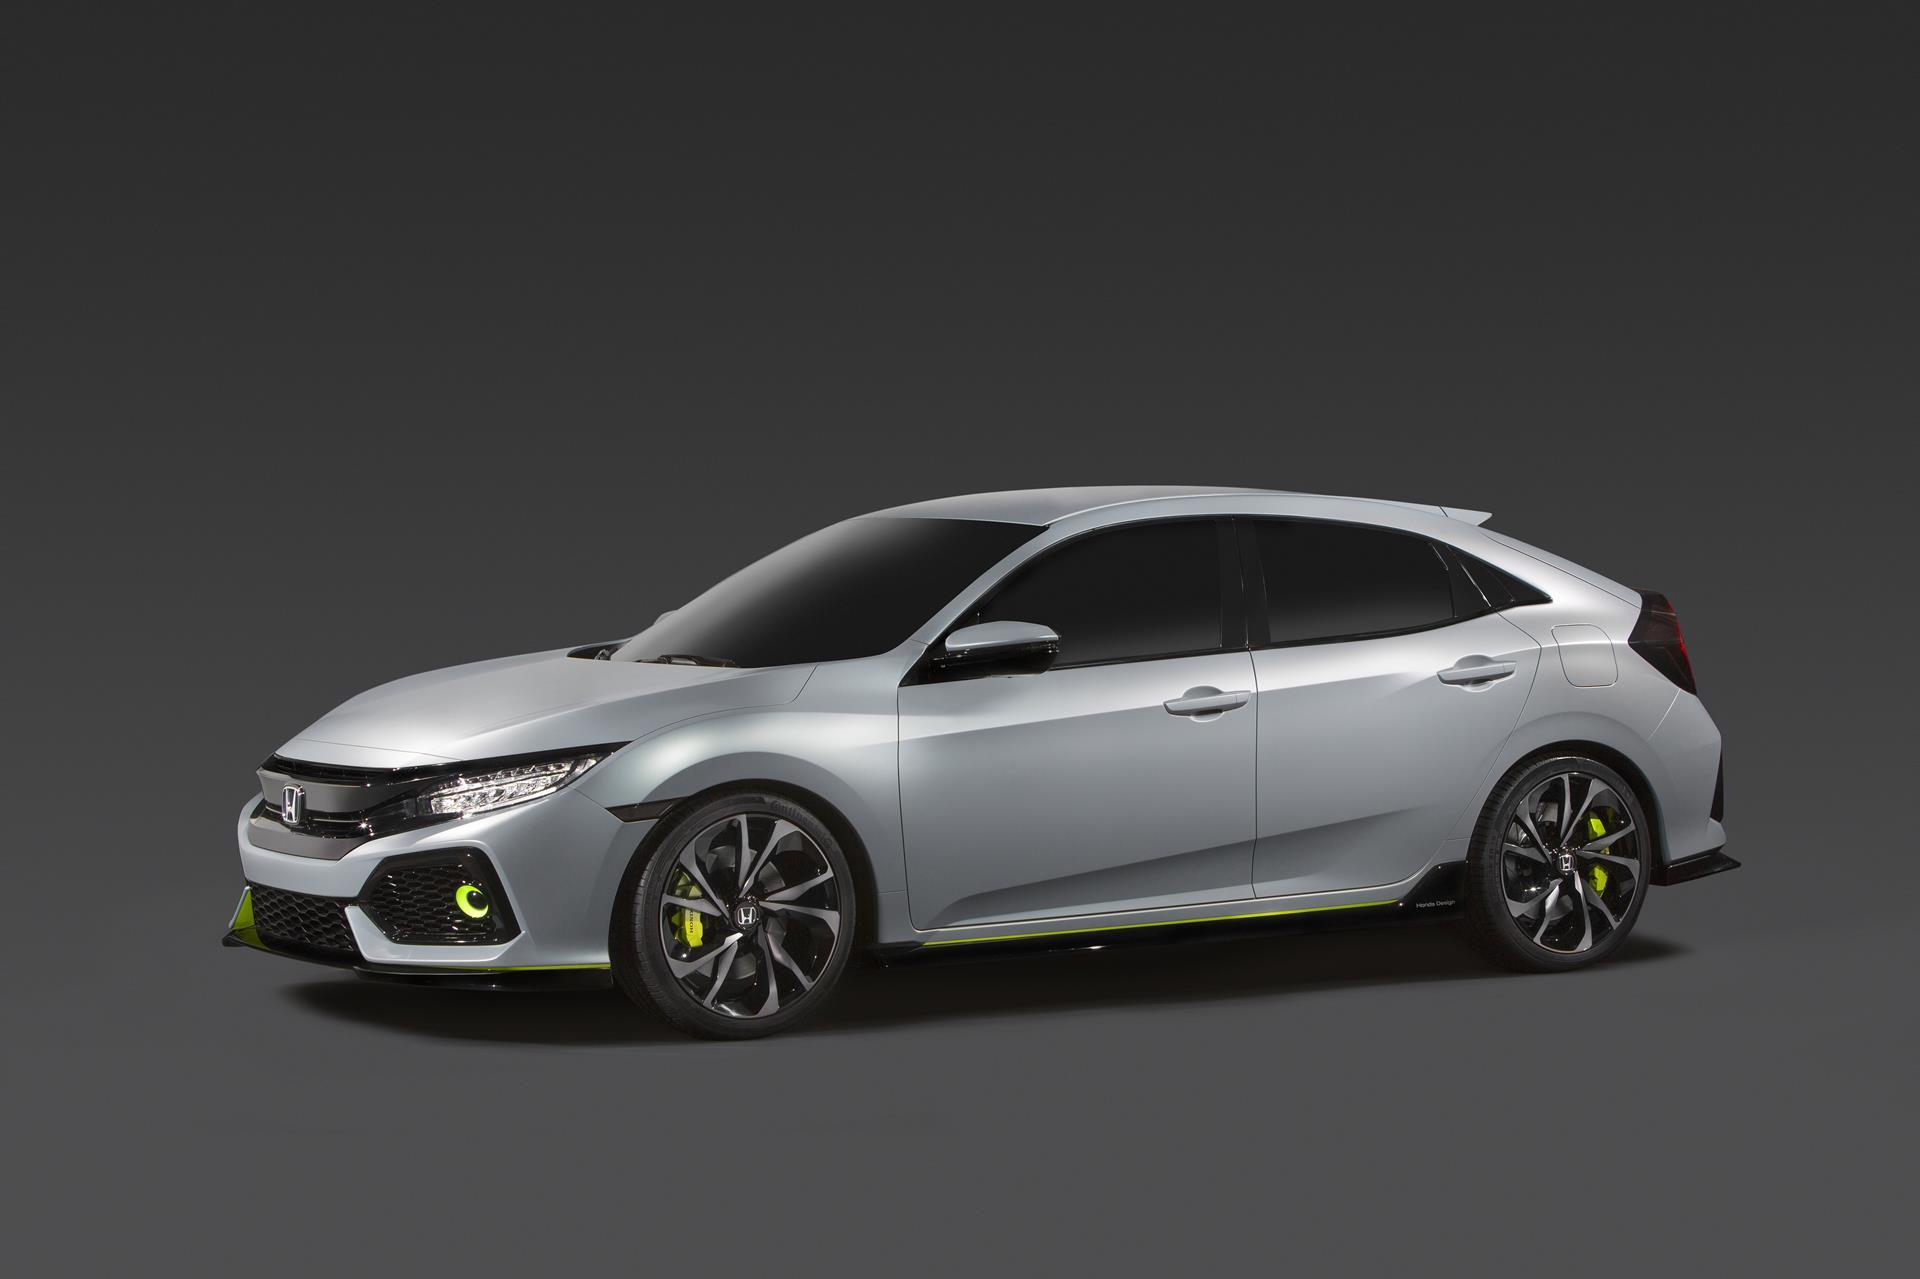 2017 Honda Civic Hatchback Prototype Pictures News